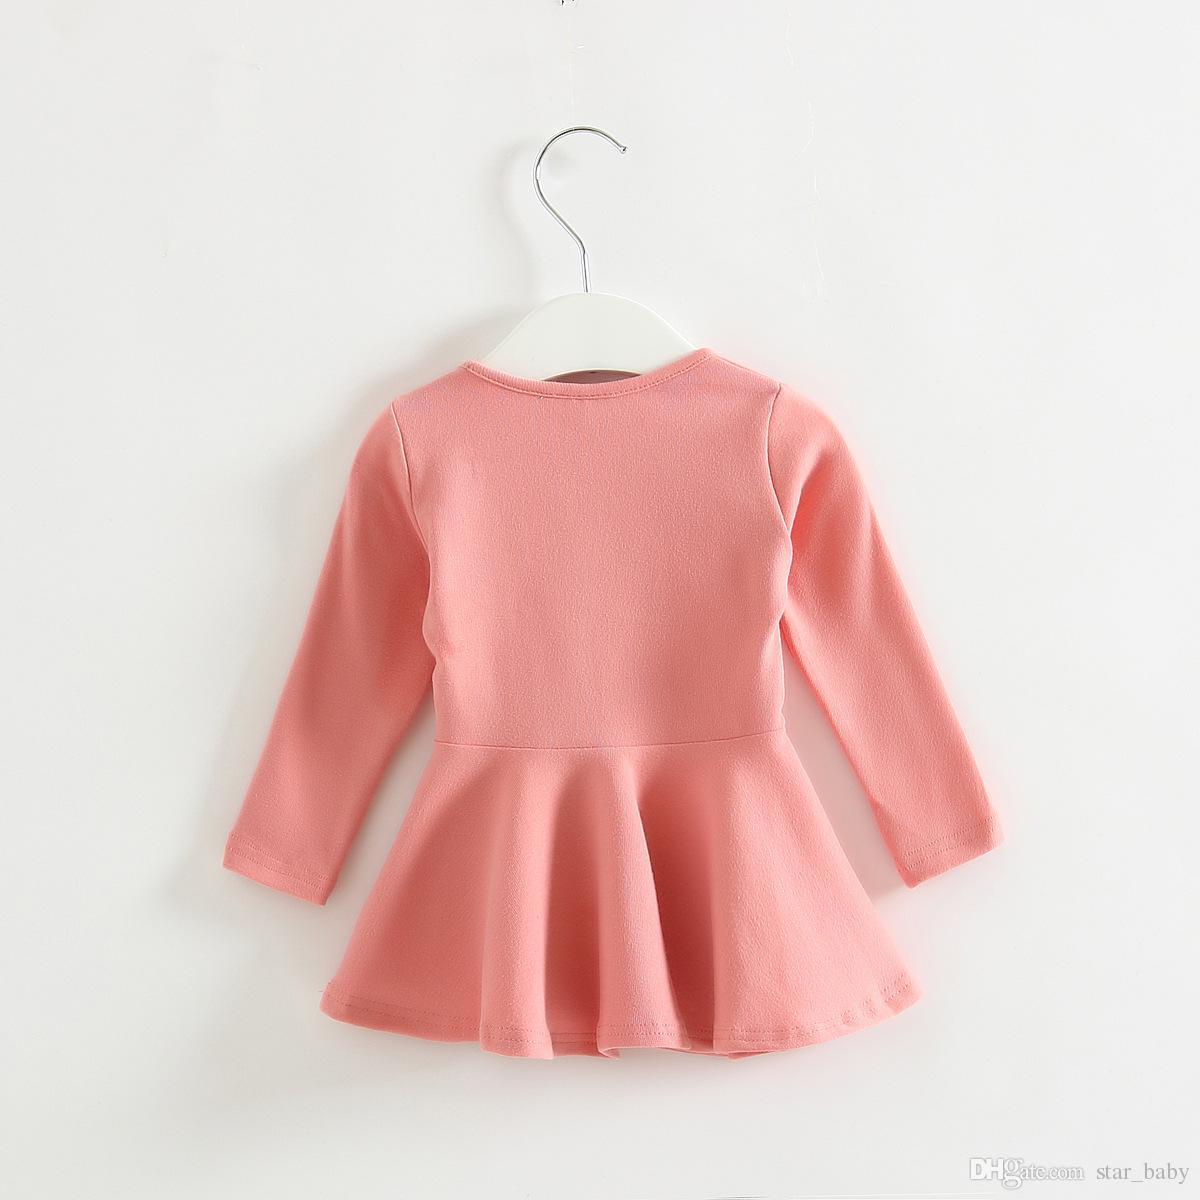 2015 Fashion Dresses Solid Girls Dress Princess Leisure Basic Wear Sleeveless Children Kids Dress Clothes Pink White Fuchsia Grey K5009